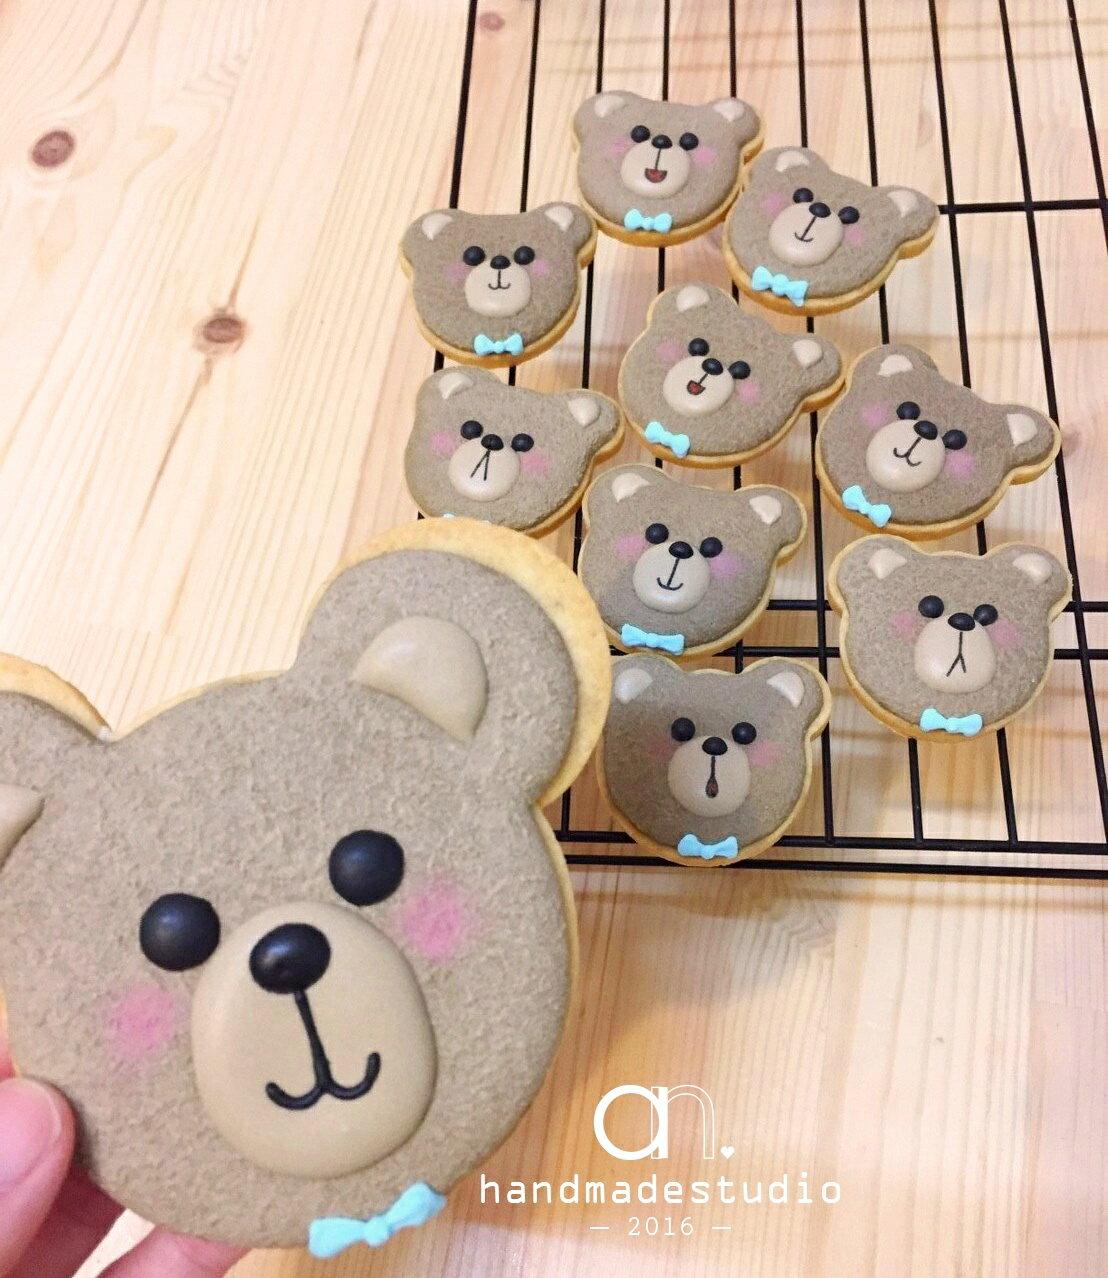 Teddy Bear 可愛小熊頭糖霜餅乾(10入) by anStudio - 限時優惠好康折扣